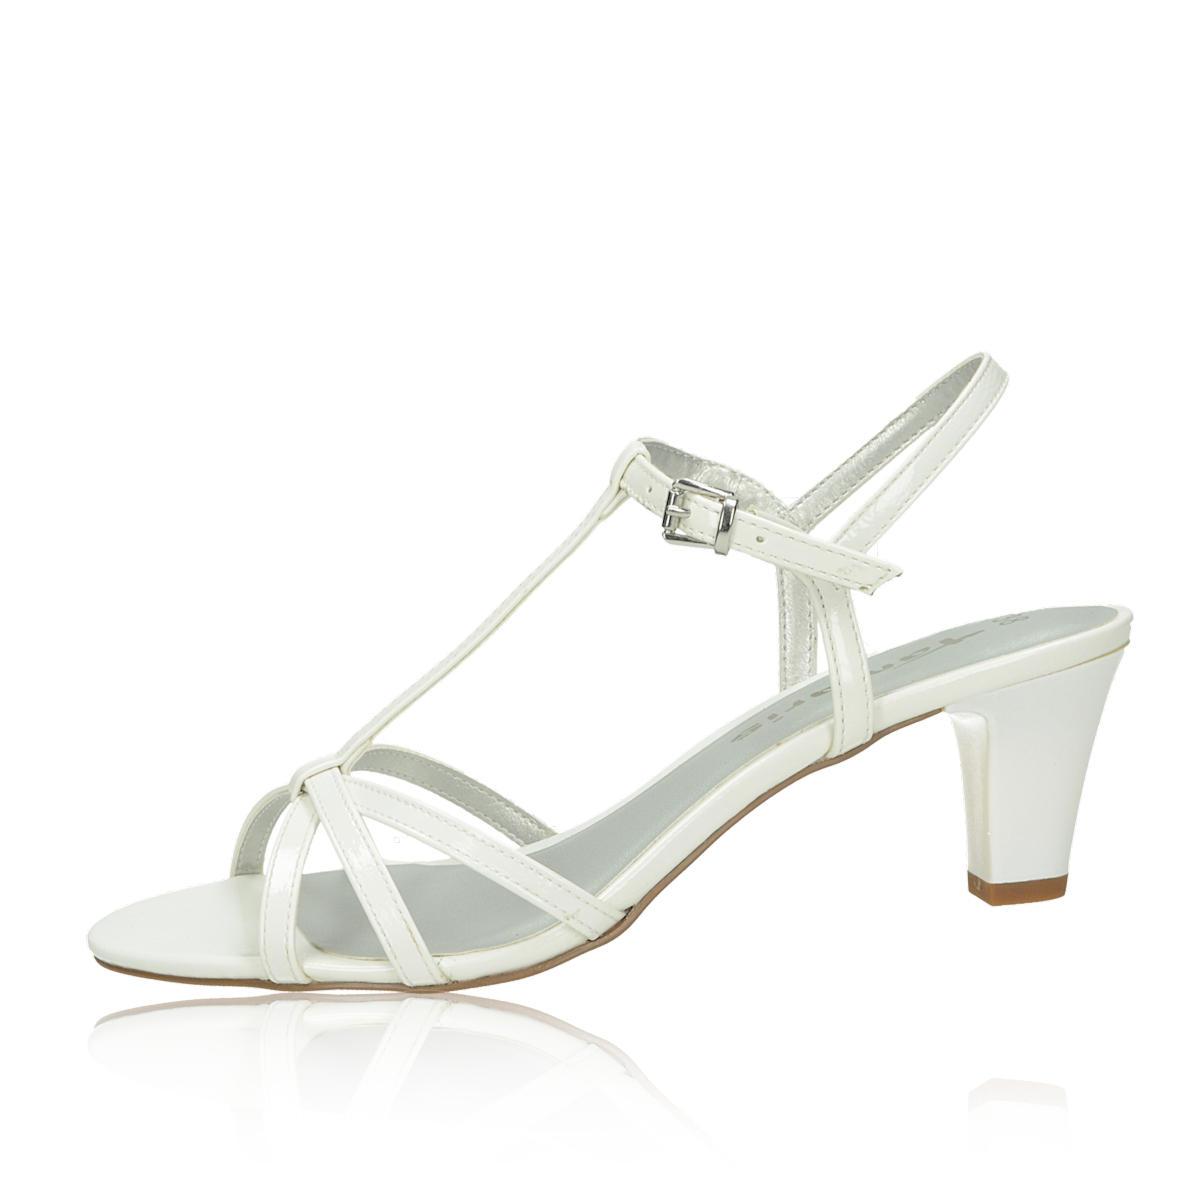 d7ceb048be97 Tamaris dámske štýlové sandále - biele Tamaris dámske štýlové sandále -  biele ...